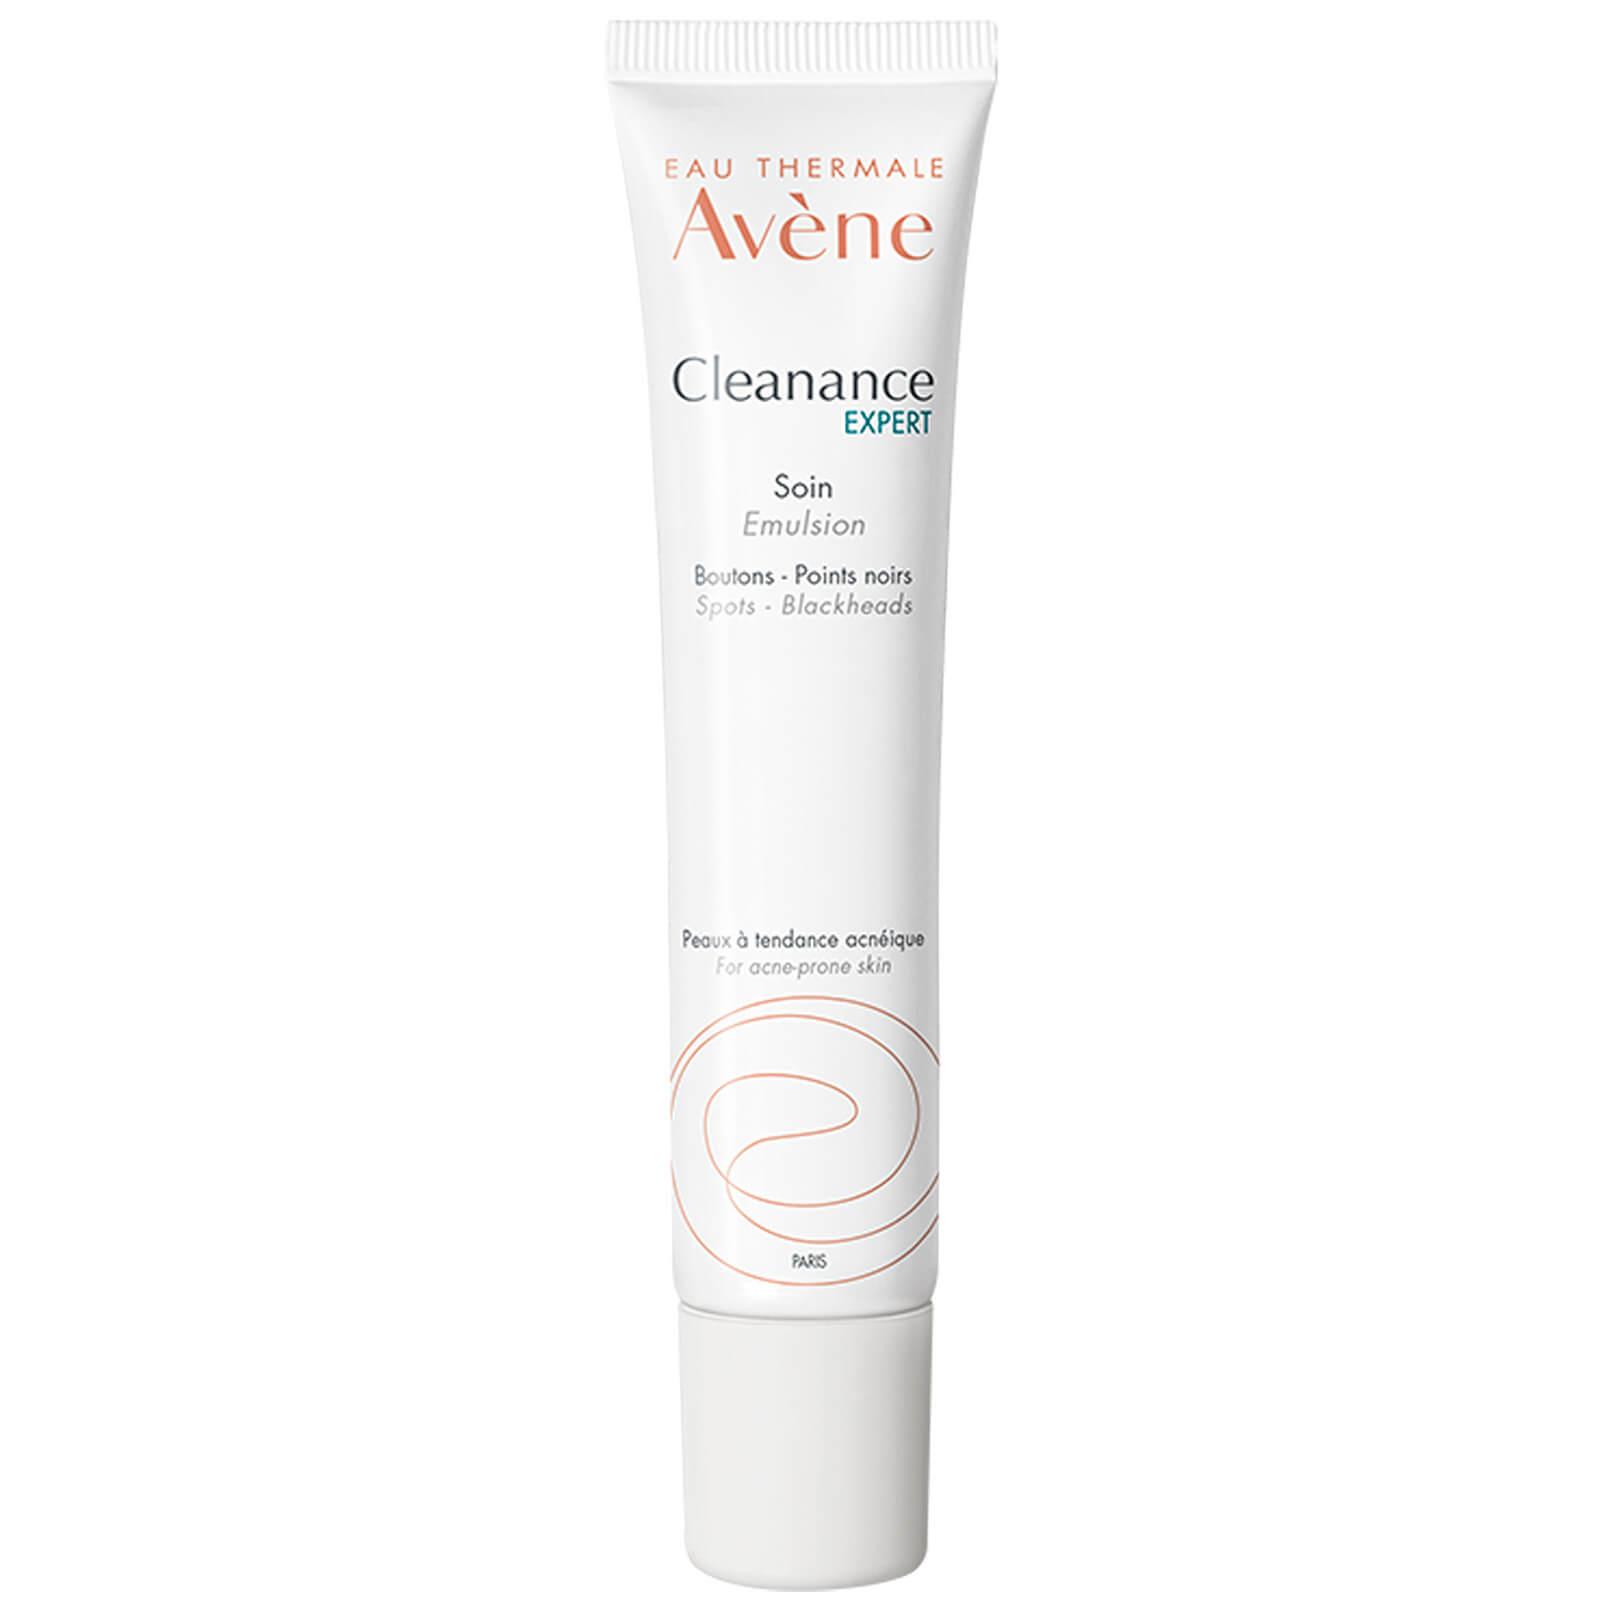 Купить Avène Cleanance Expert Moisturiser for Oily, Blemish-Prone Skin 40ml